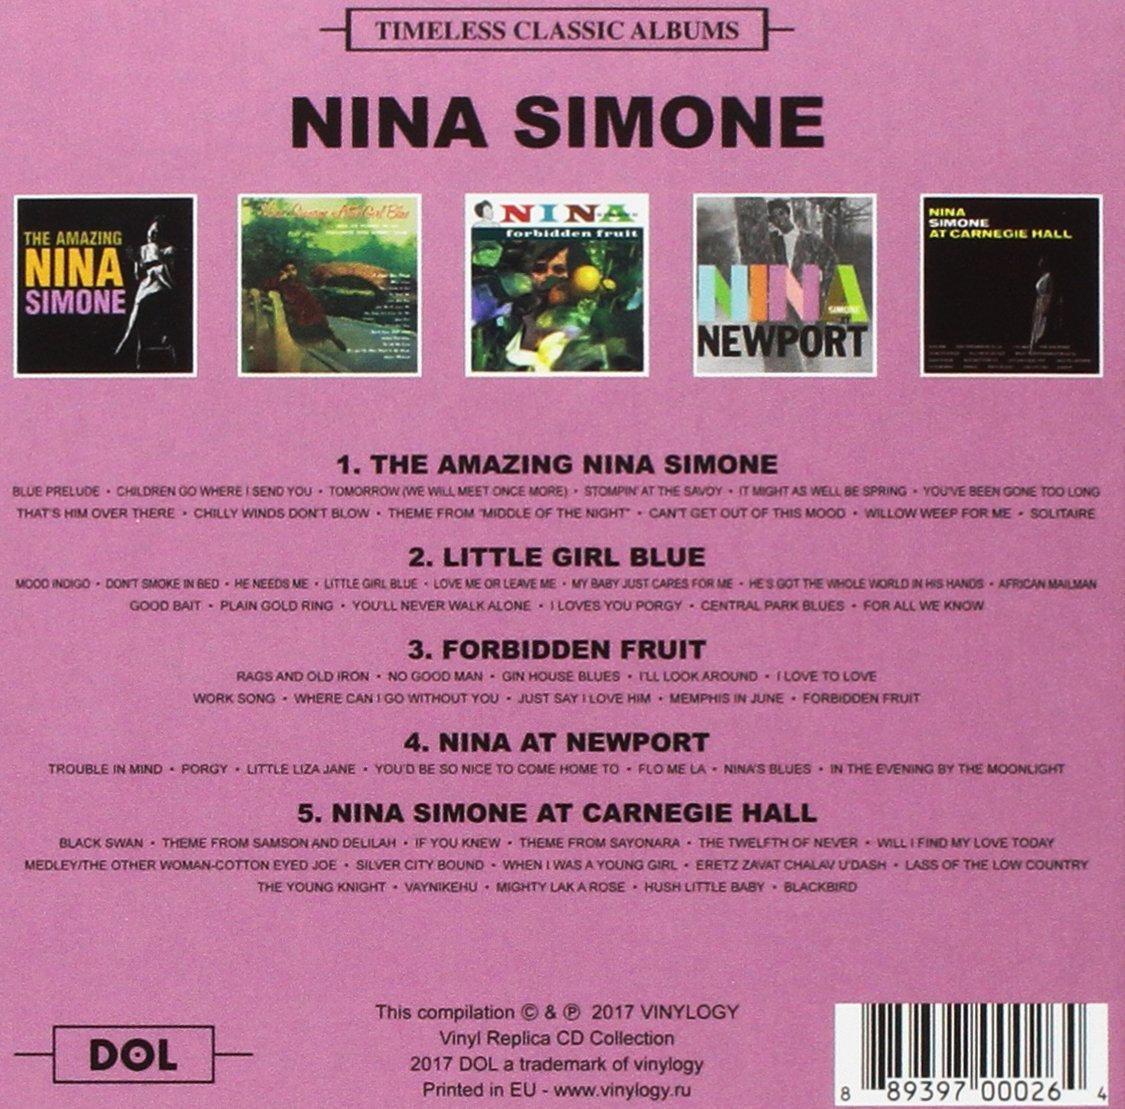 NINA SIMONE BOX SET 5xCD Timeless Classic Albums | shivamusic